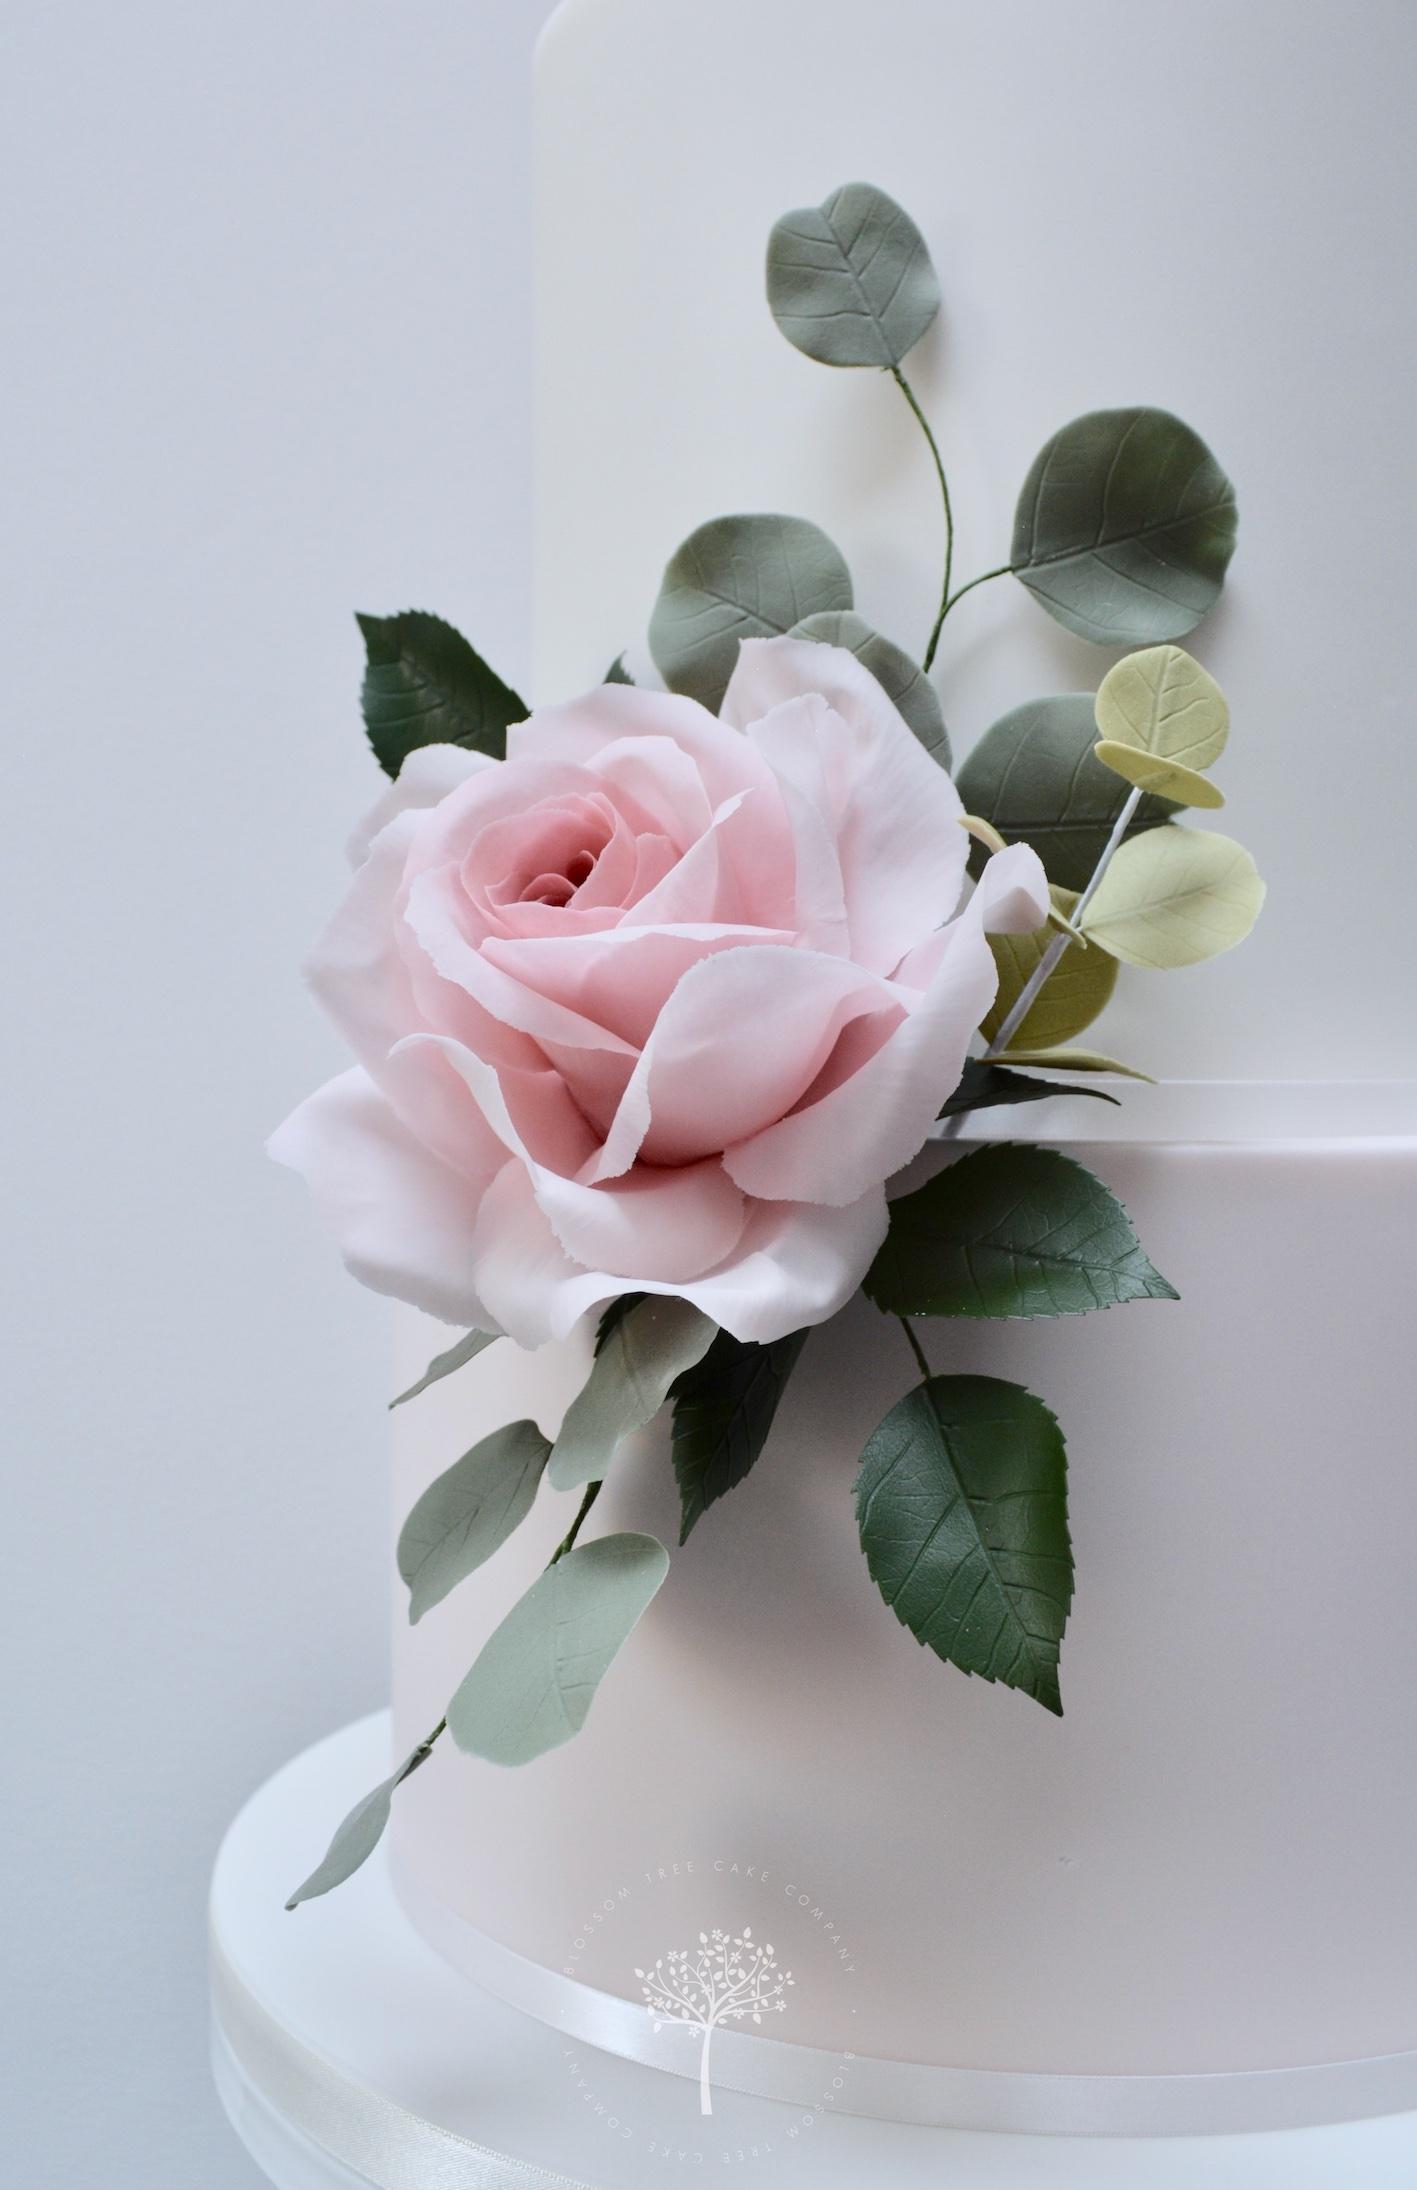 Garden Rose wedding cake by Blossom Tree Cake Company Harrogate North Yorkshire - sugar rose.jpg